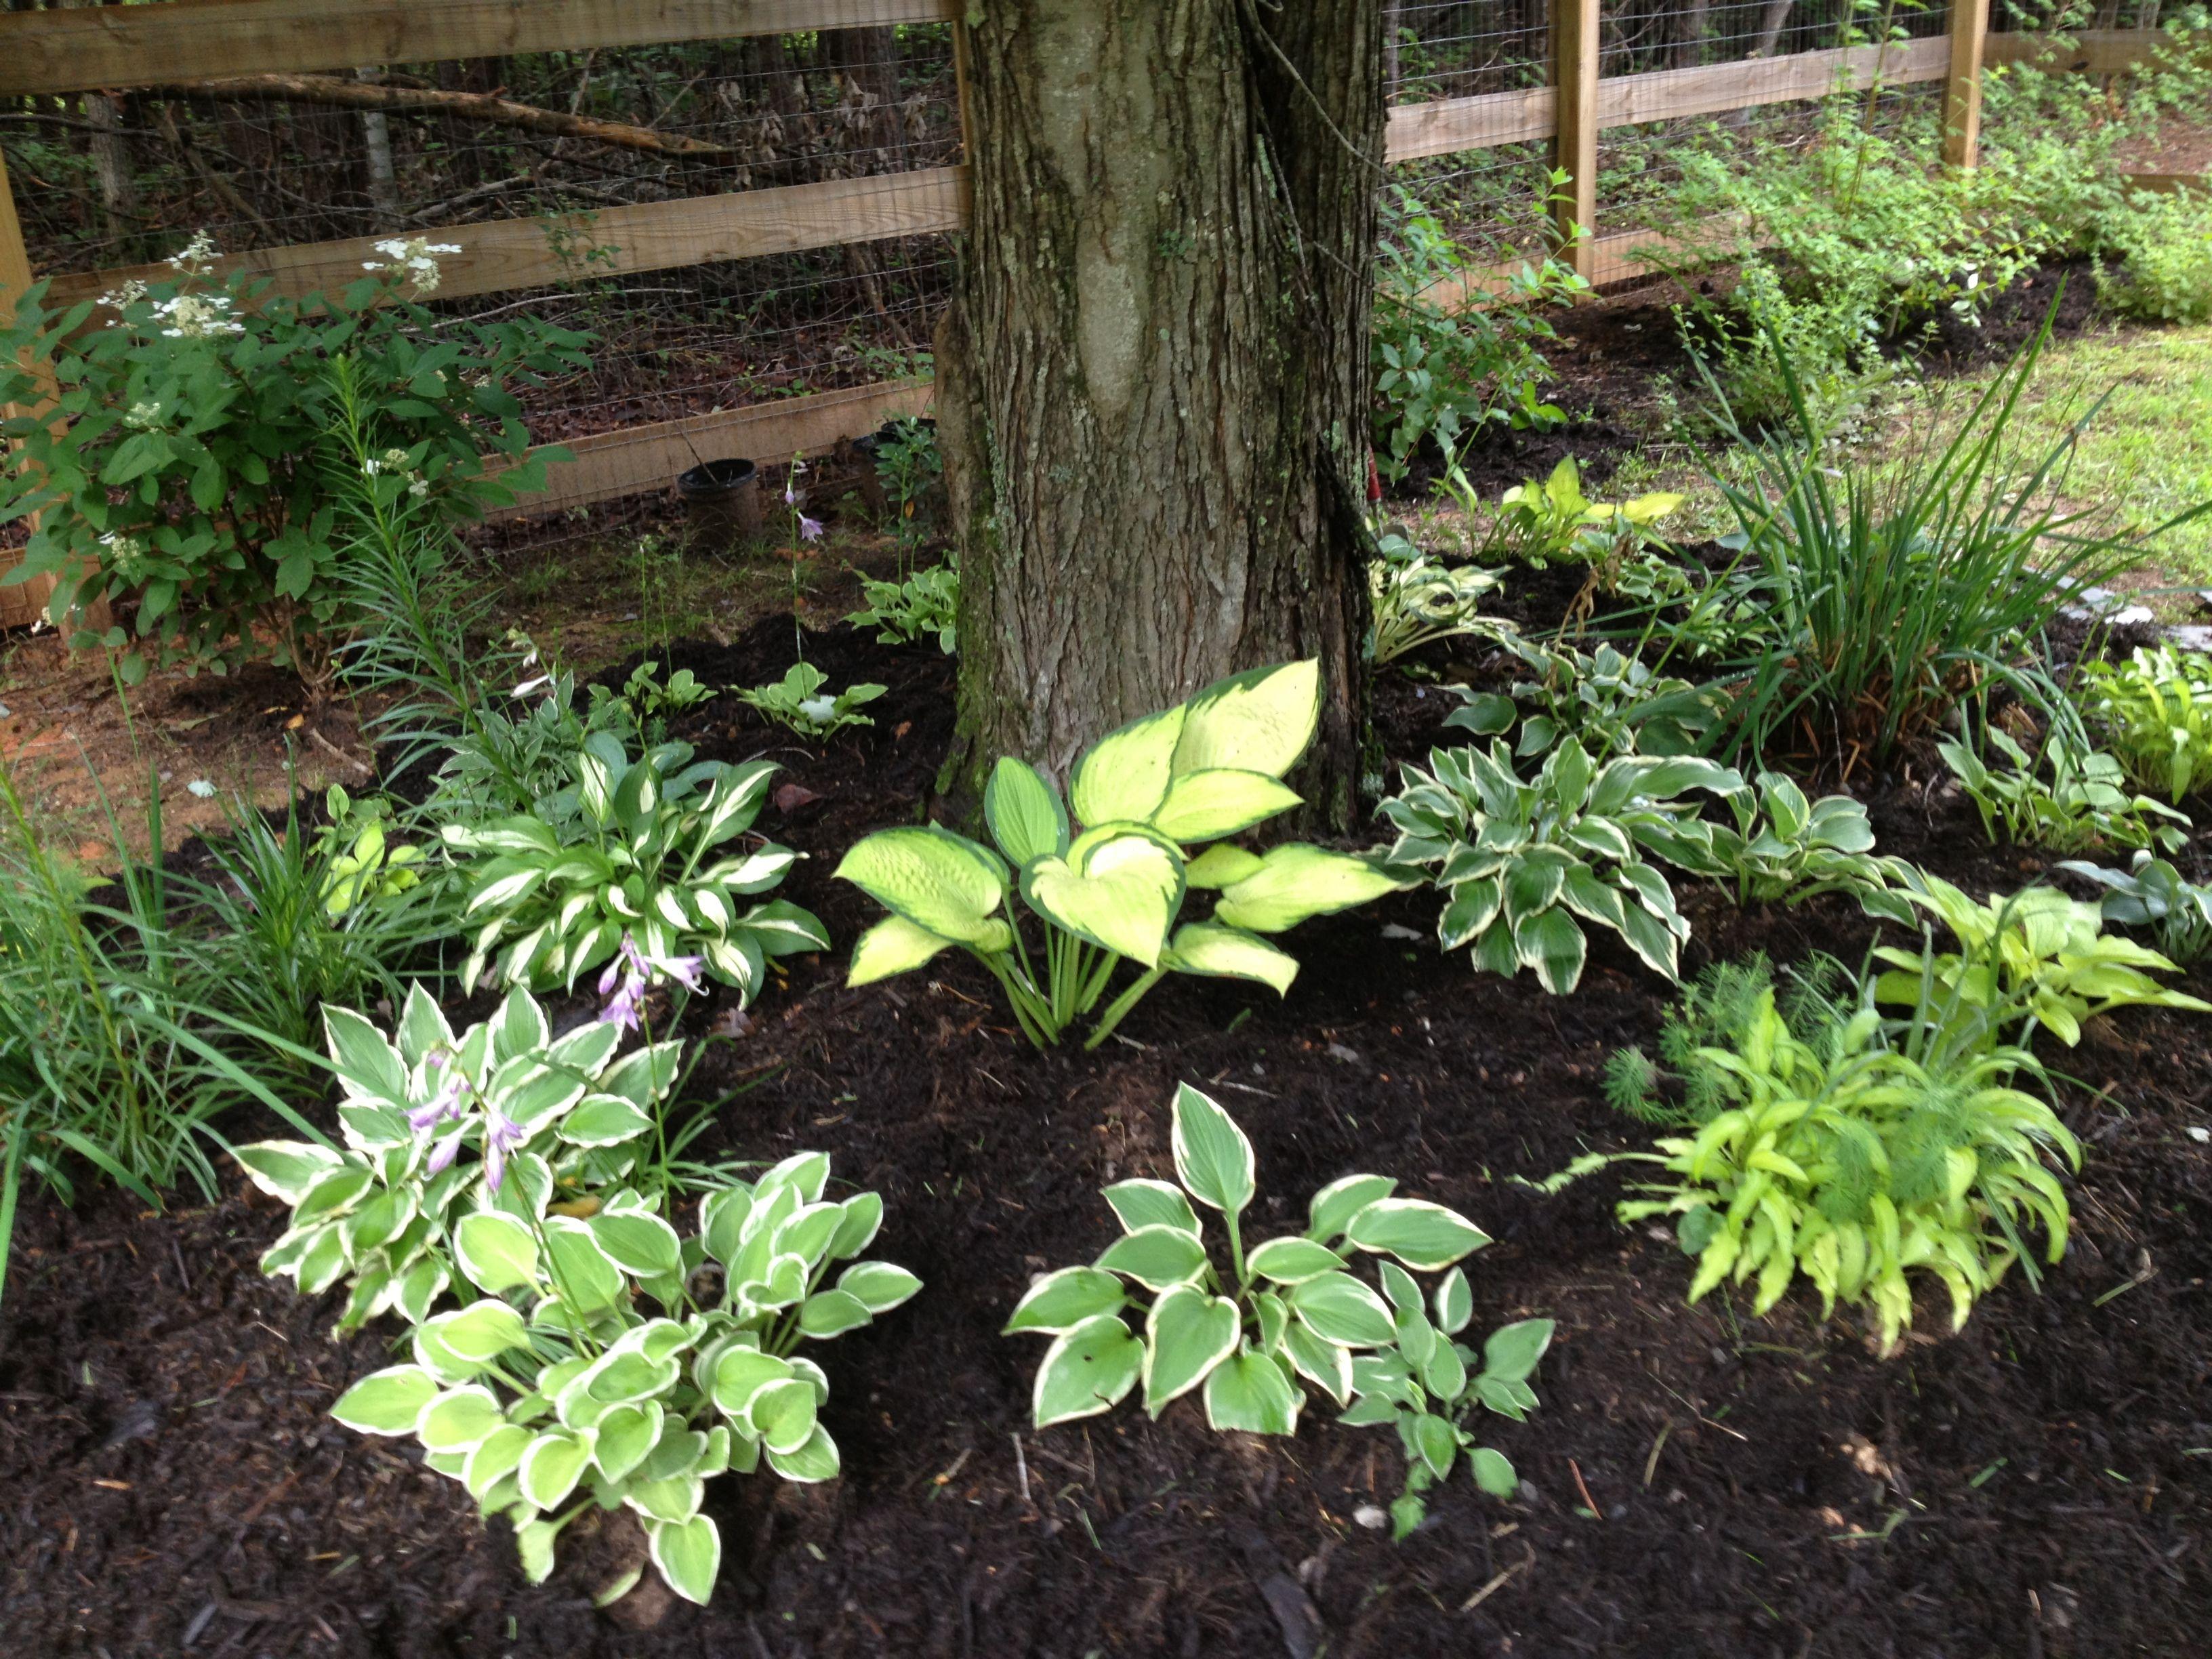 Flower garden ideas for under a tree - Hostas Lovely Under A Shade Tree